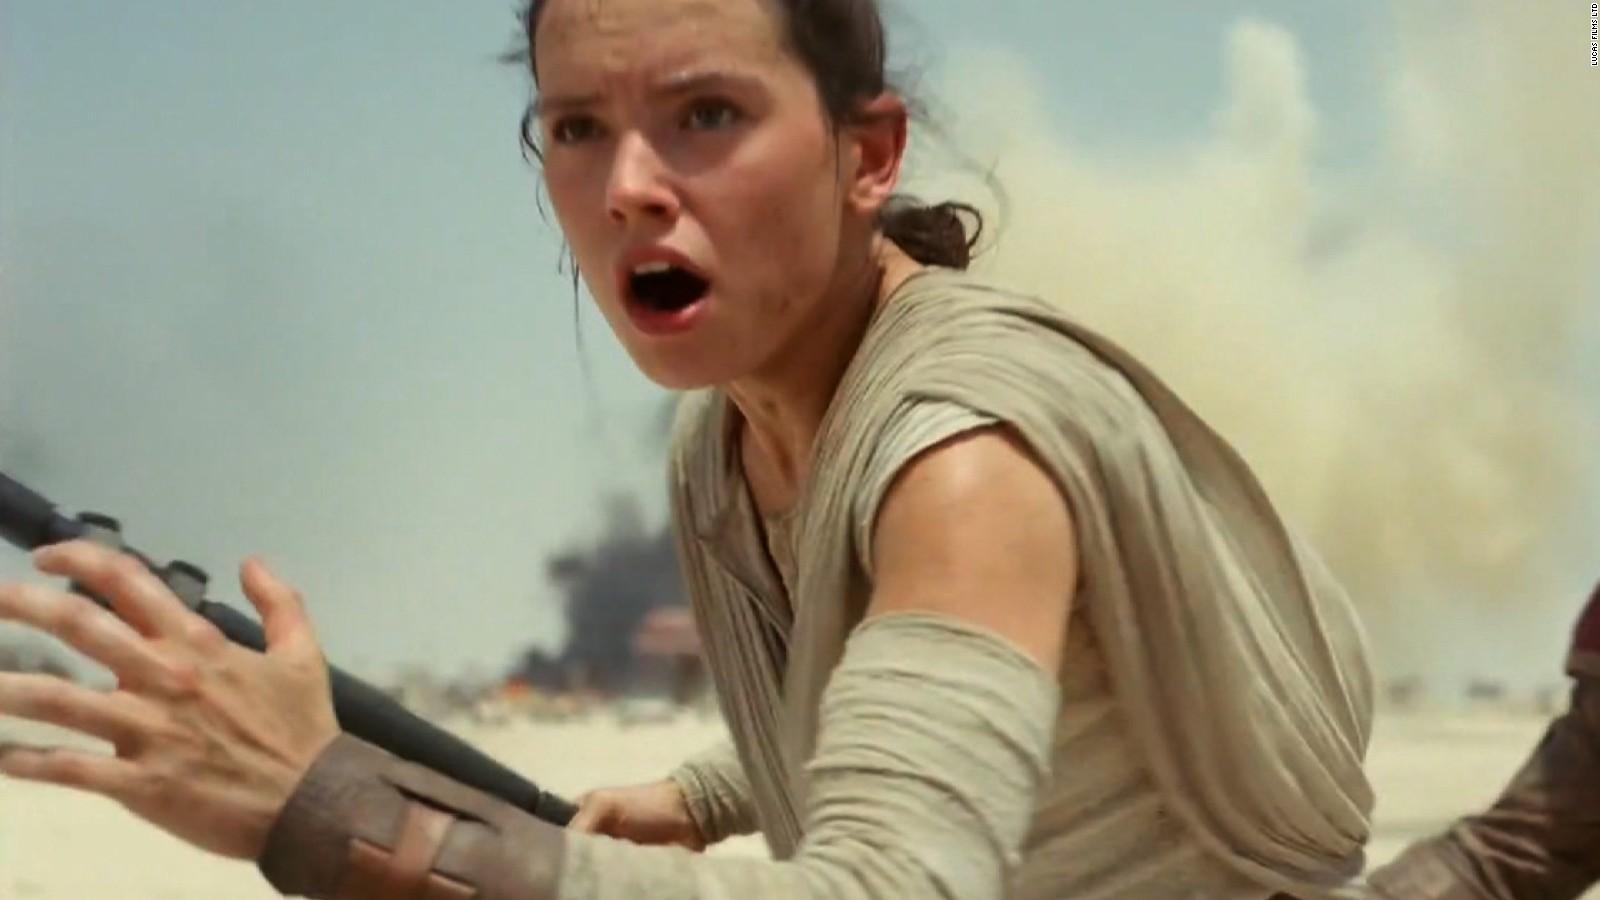 Daisy Ridley Star Wars Wallpaper: Daisy Ridley Star Wars Wallpaper